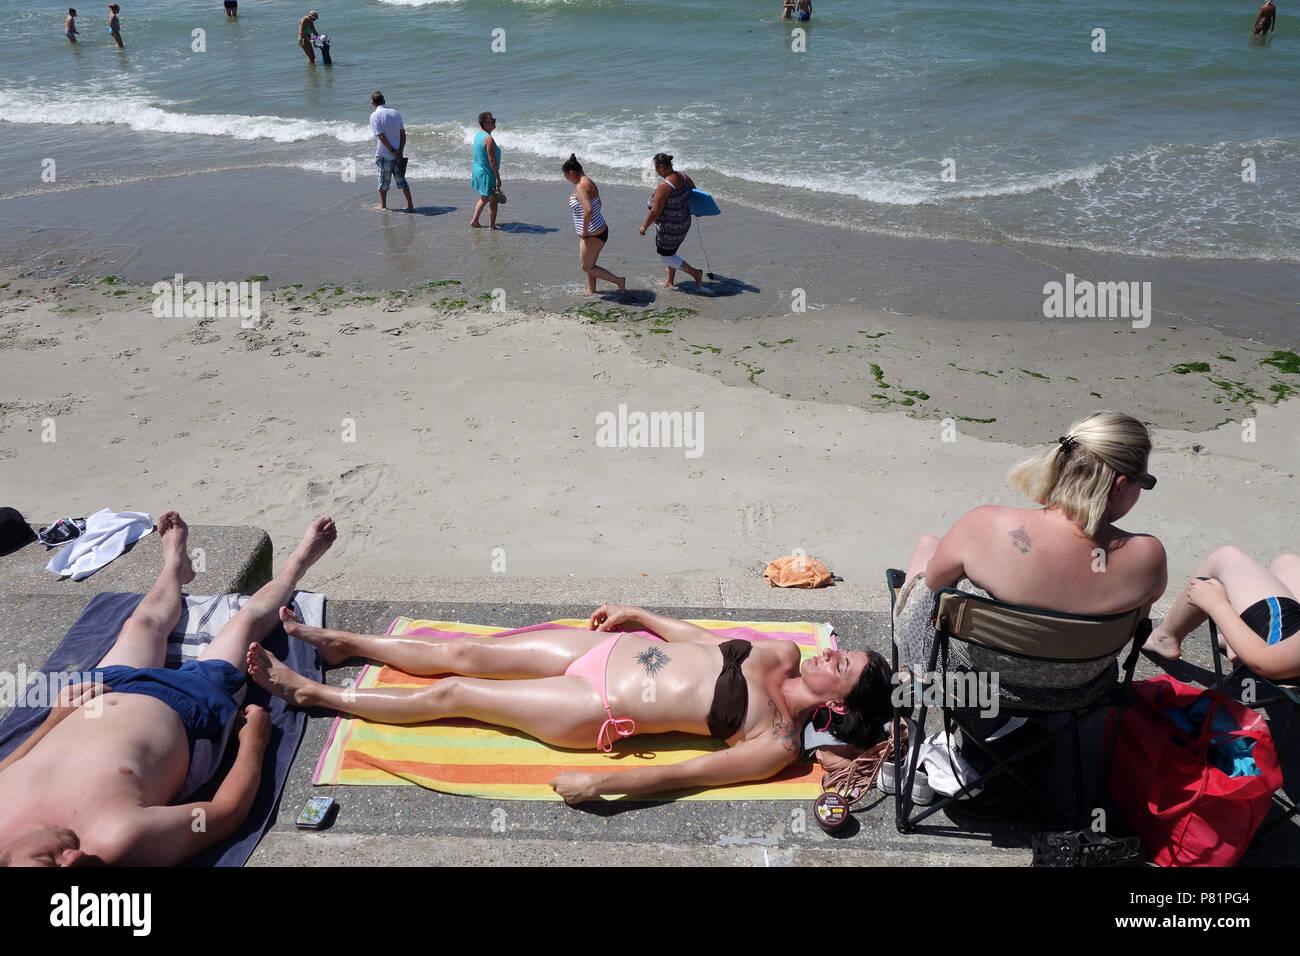 The beach Wimereux in the Pas-de-Calais department in the Hauts-de-France region of France. - Stock Image